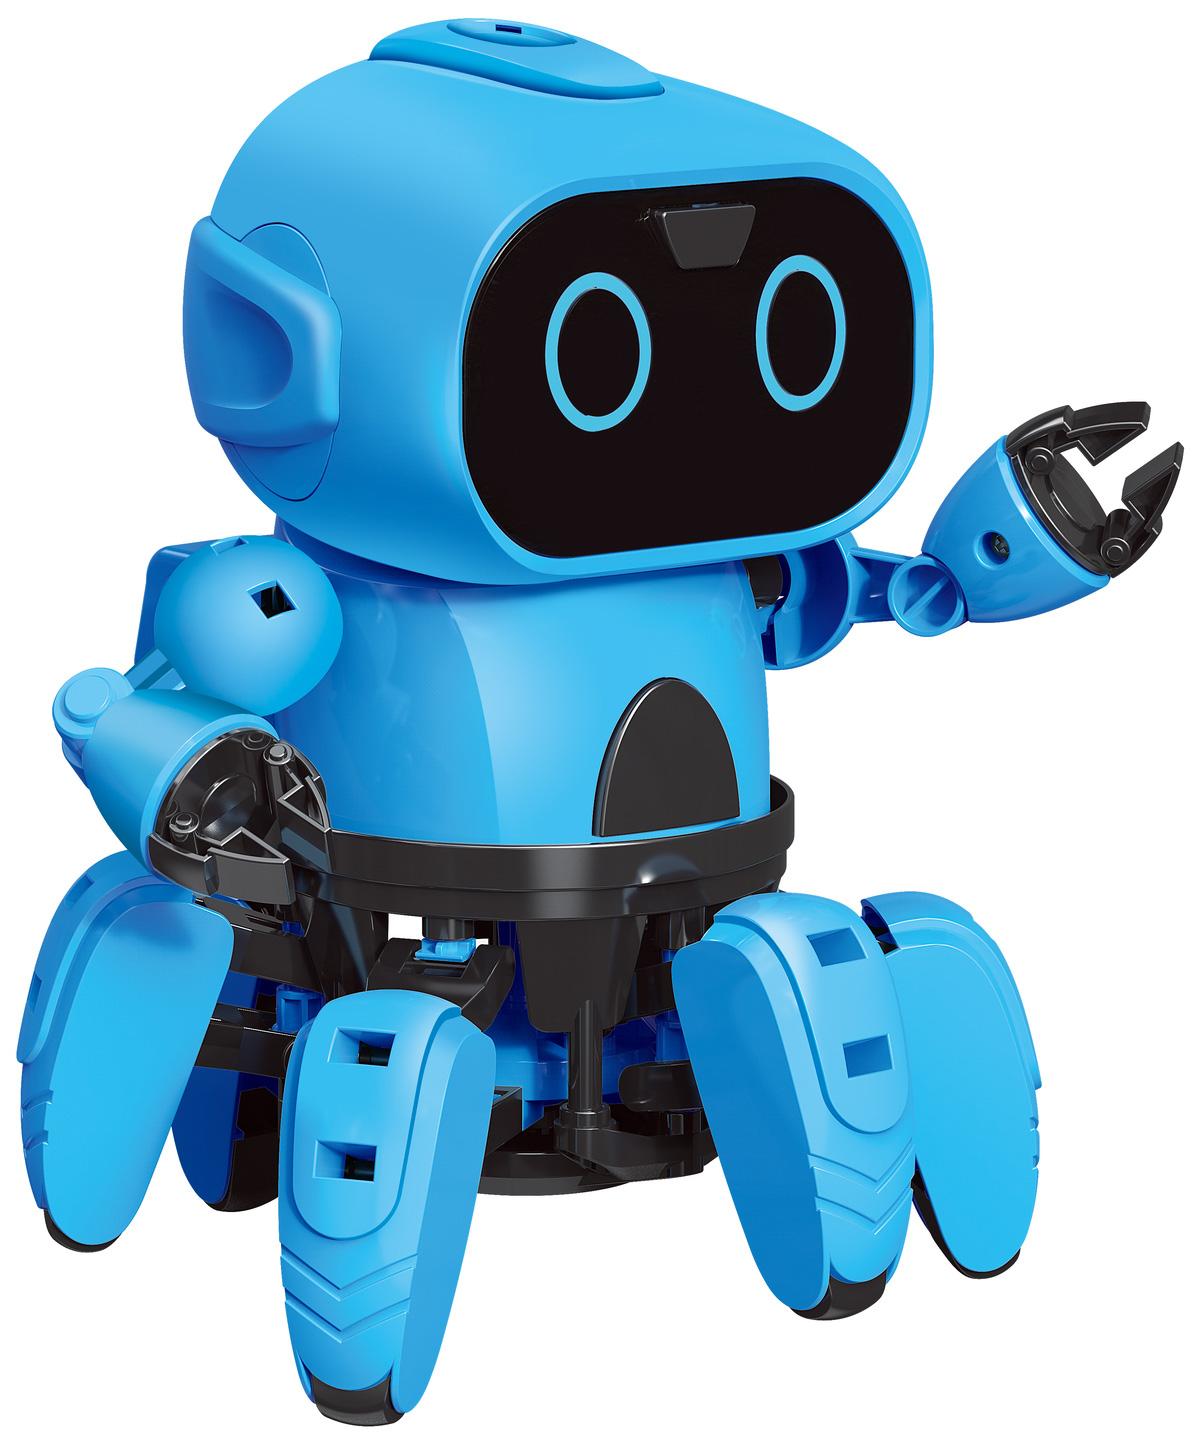 Конструктор Робот Тобби